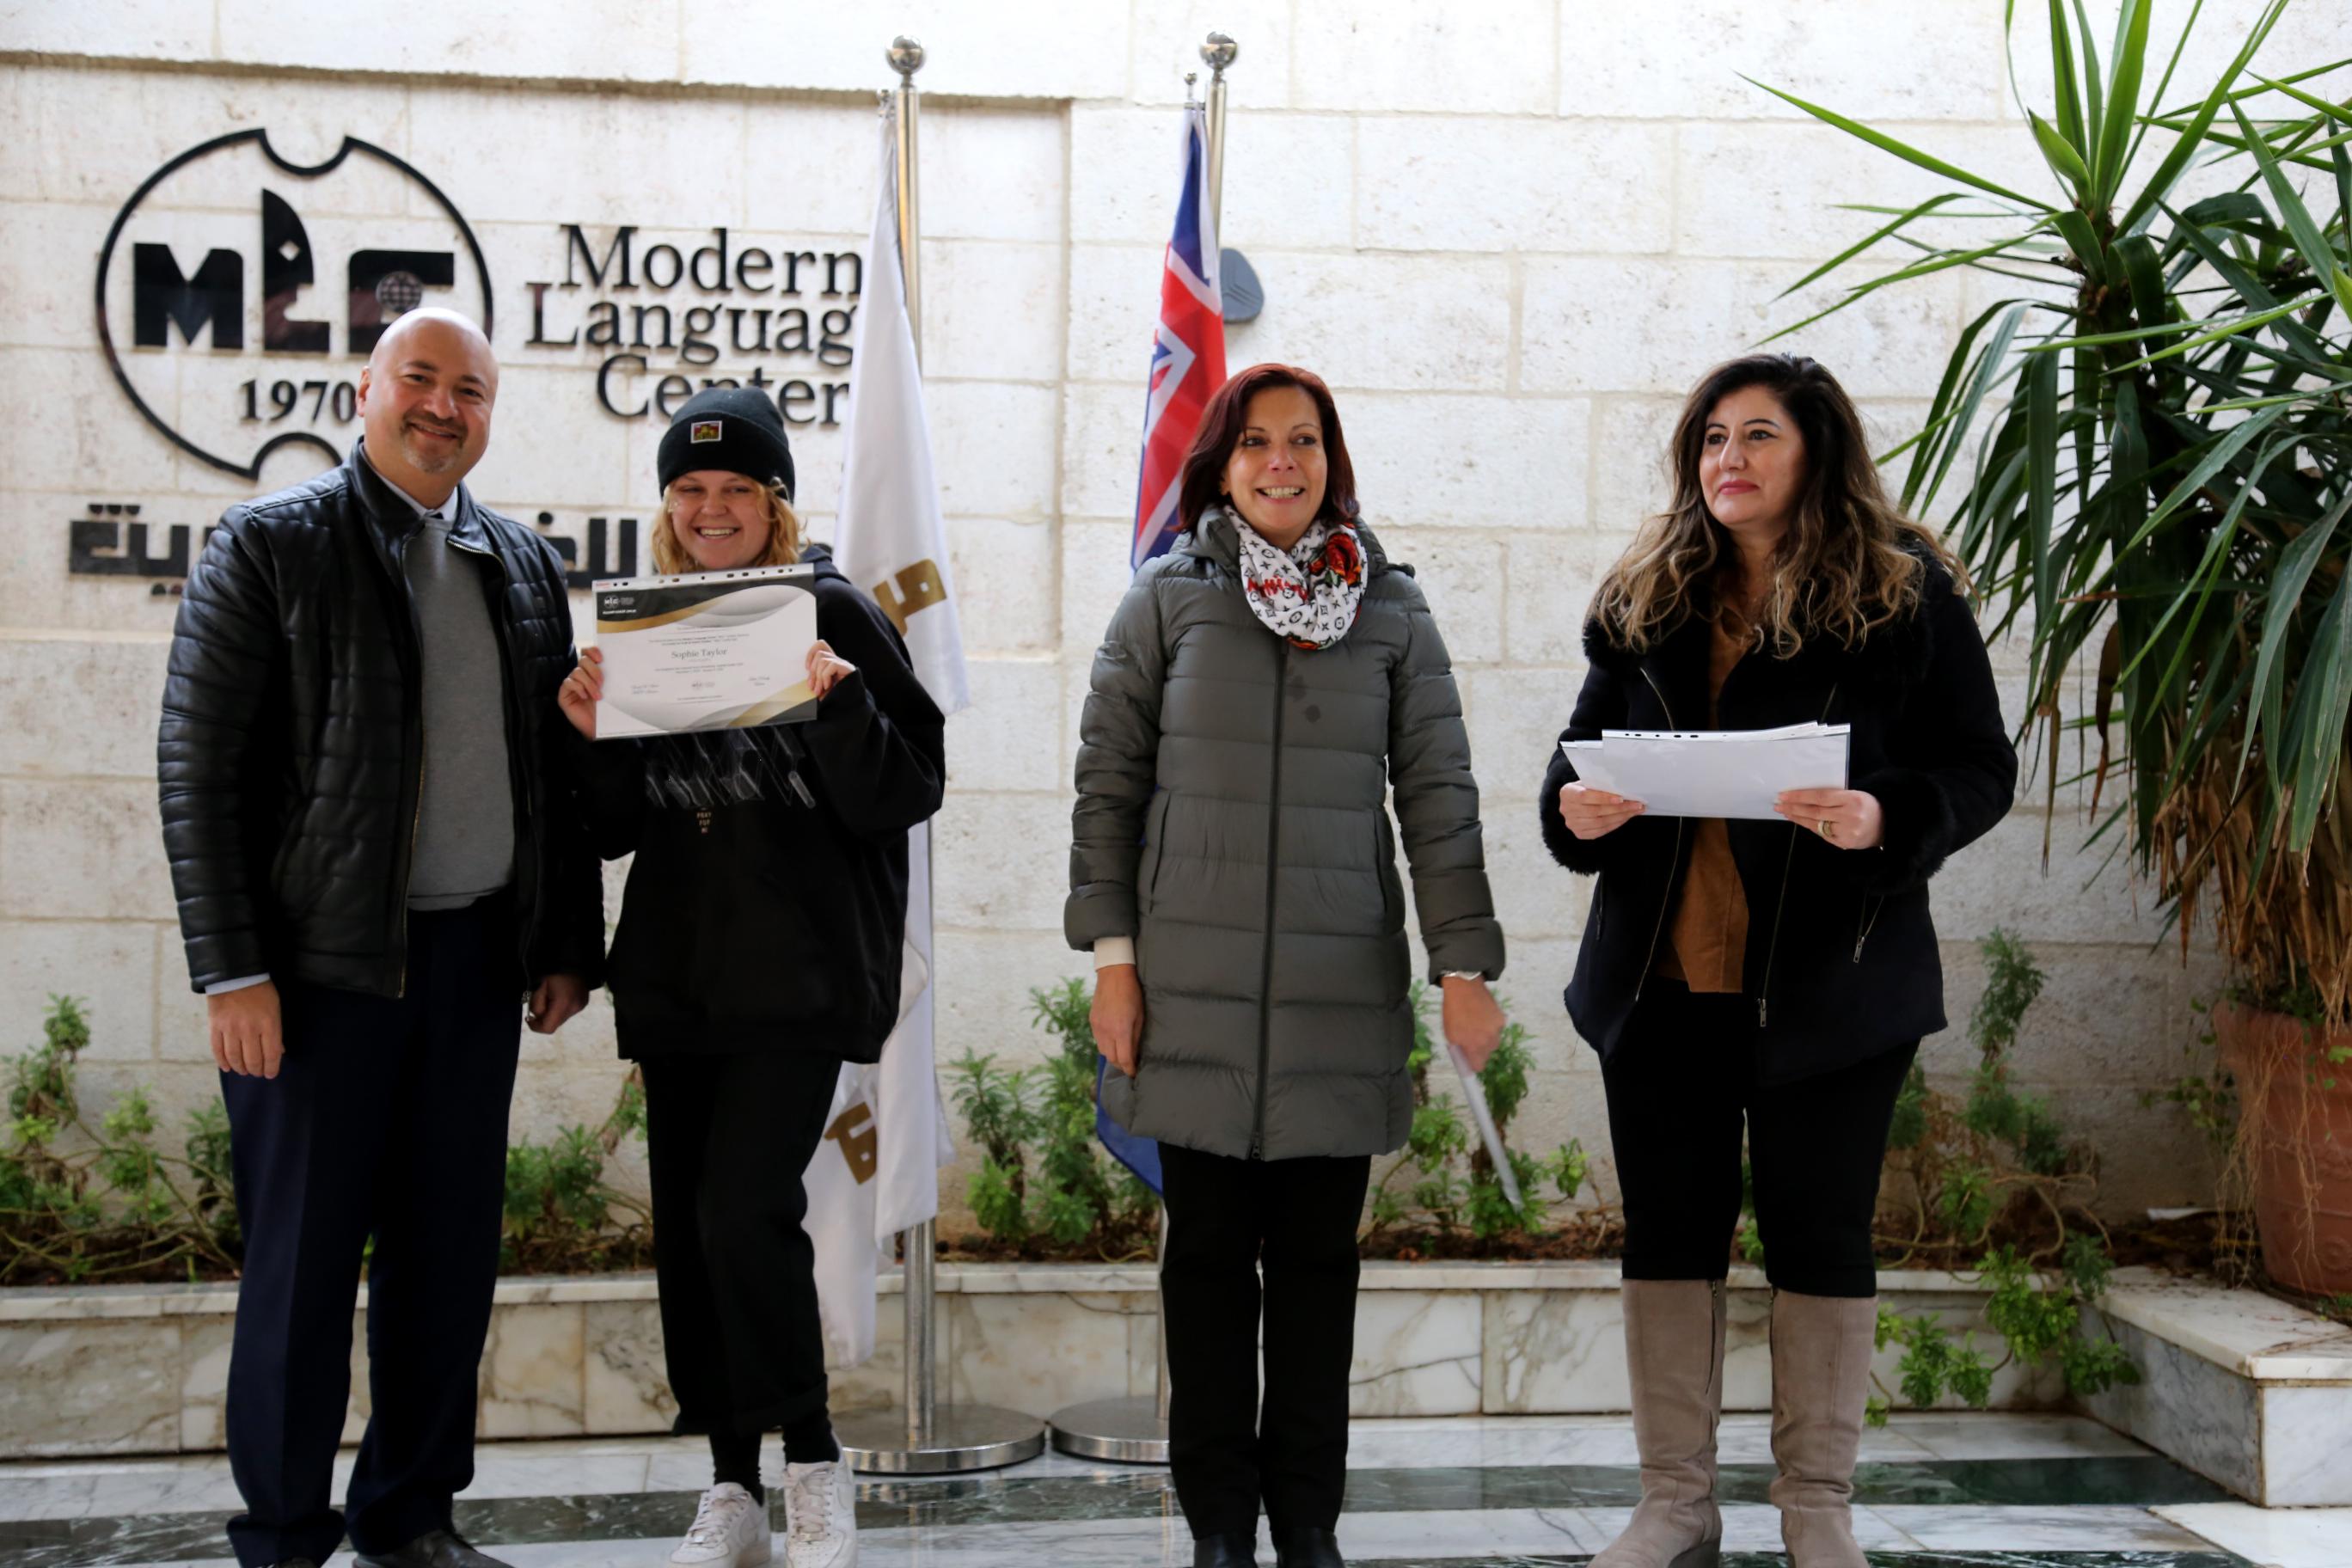 Australian National University Arabic Study Abroad Program at the Modern Language Center in Amman Jordan 2020